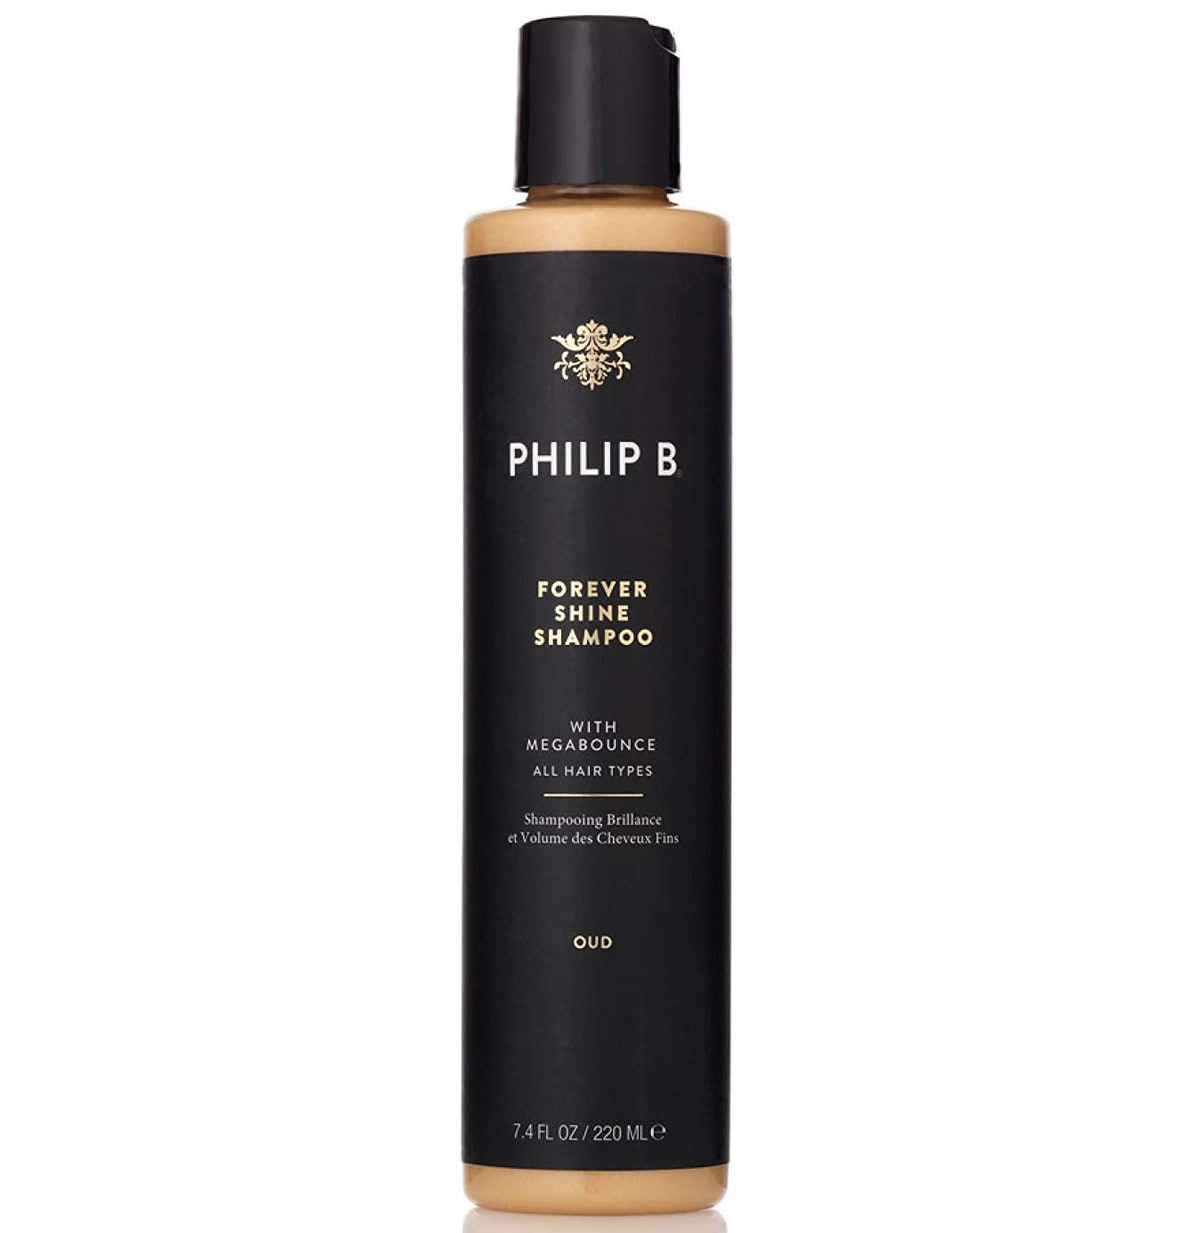 Philip B. Forever Shine Shampoo